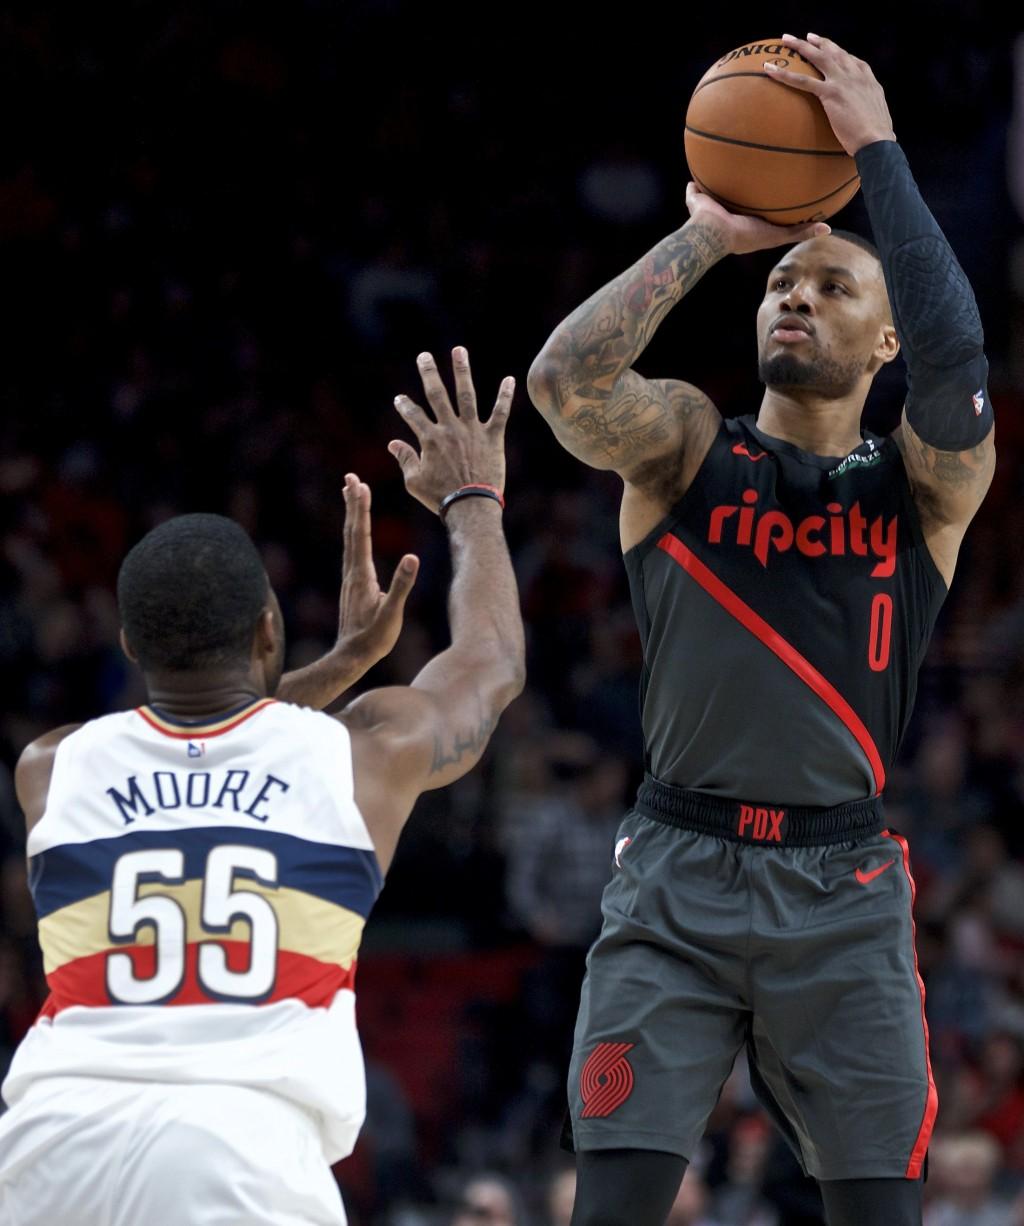 Portland Trail Blazers guard Damian Lillard, right, shoots over New Orleans Pelicans guard E'Twaun Moore during the second half of an NBA basketball g